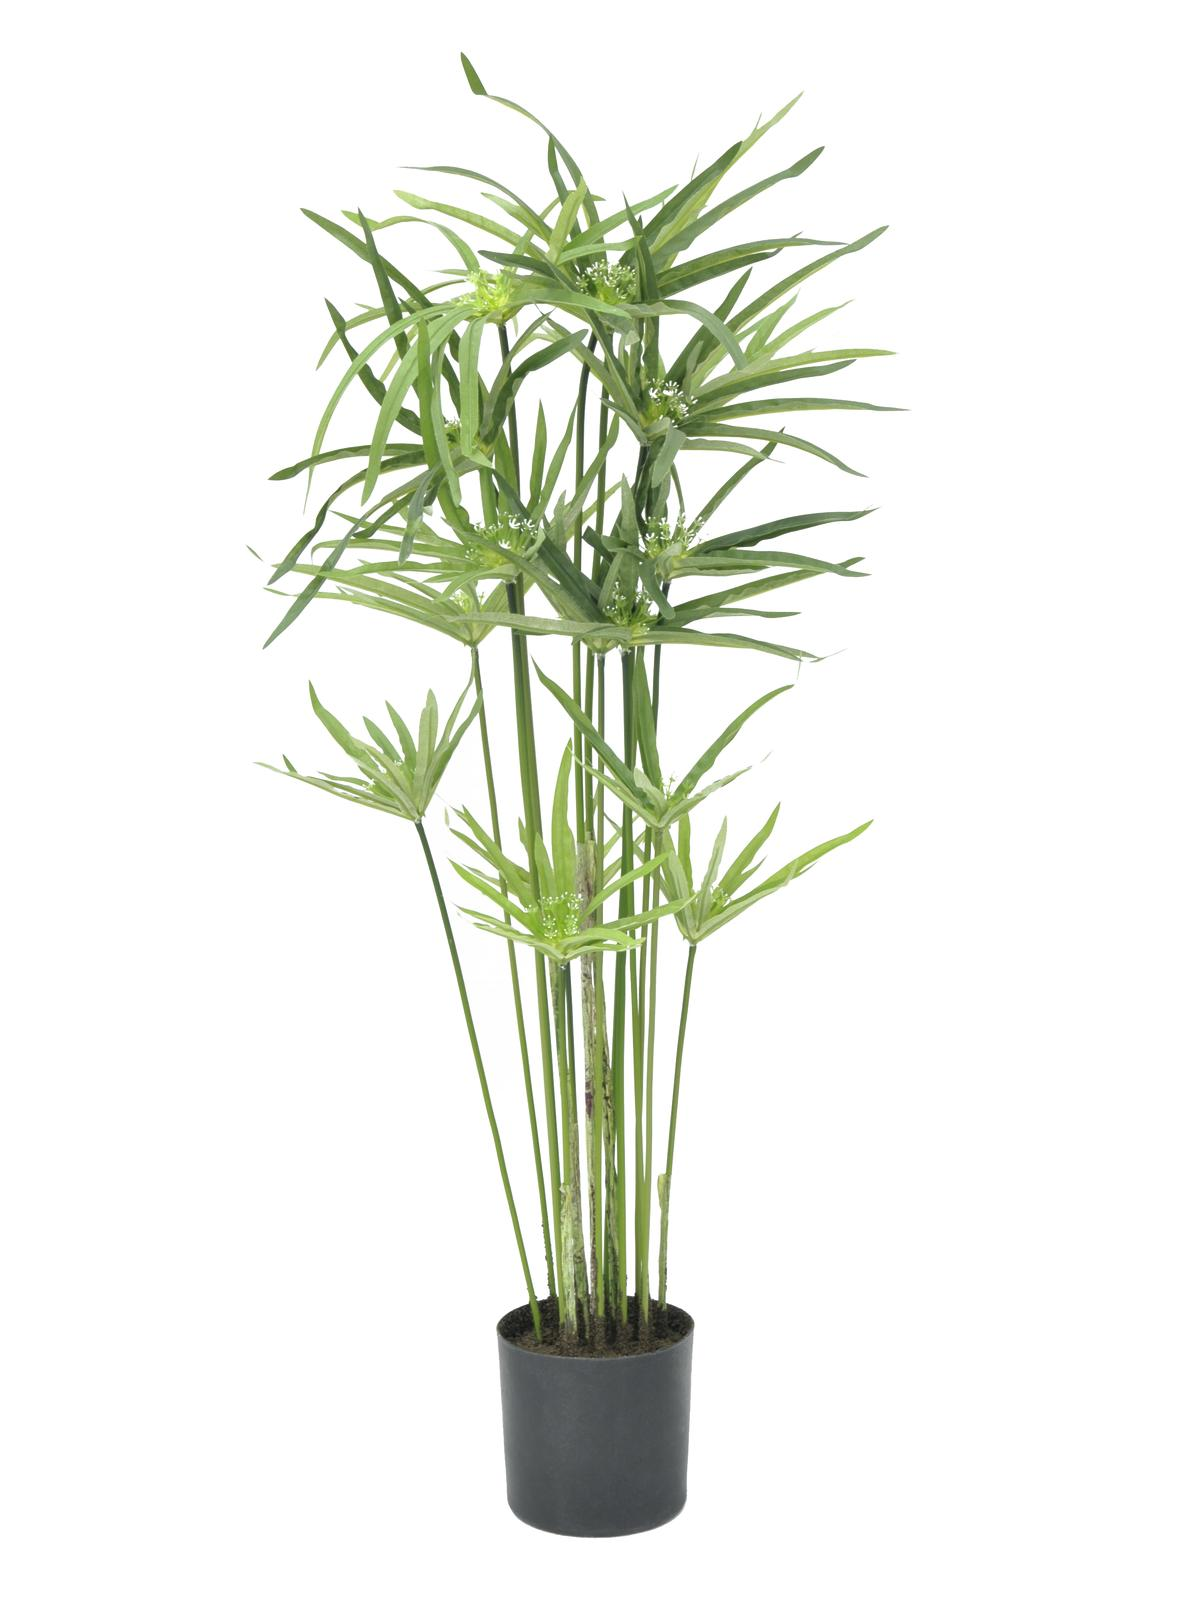 europalms-zyperngras-76cm-kunststoffpflanze